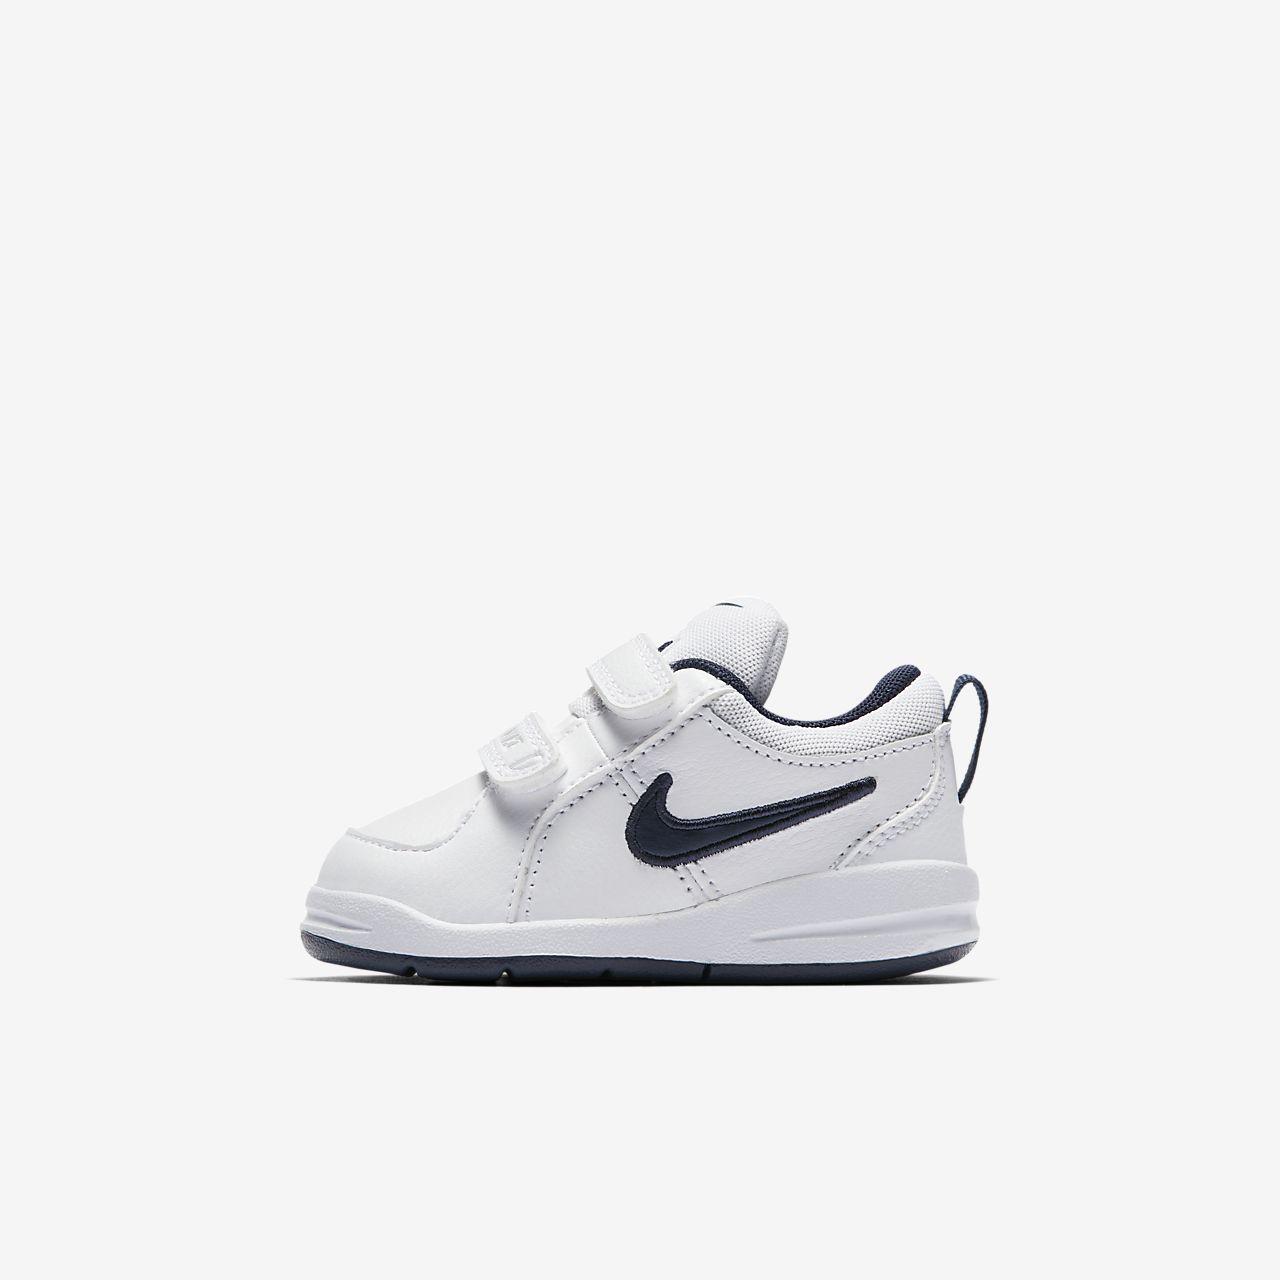 2nike neonato 18 scarpe